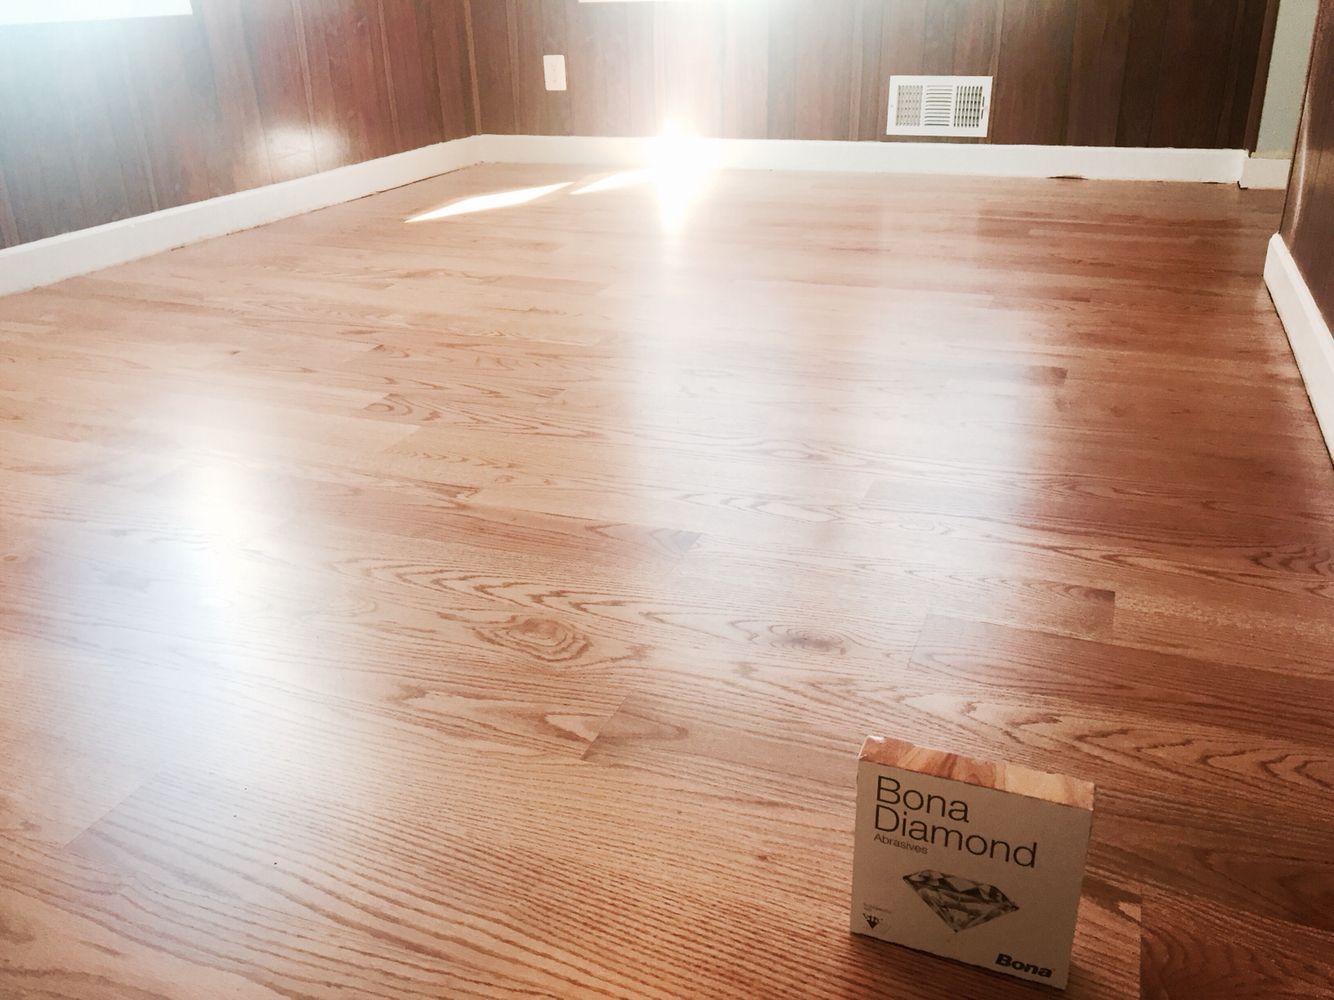 5 Red Oak Finished With Duraseal Golden Oak Pallmann X Color Sealer And 2coats Of Pallmann X96 Matte Finish Flooring Projects Hardwood Floors Red Oak